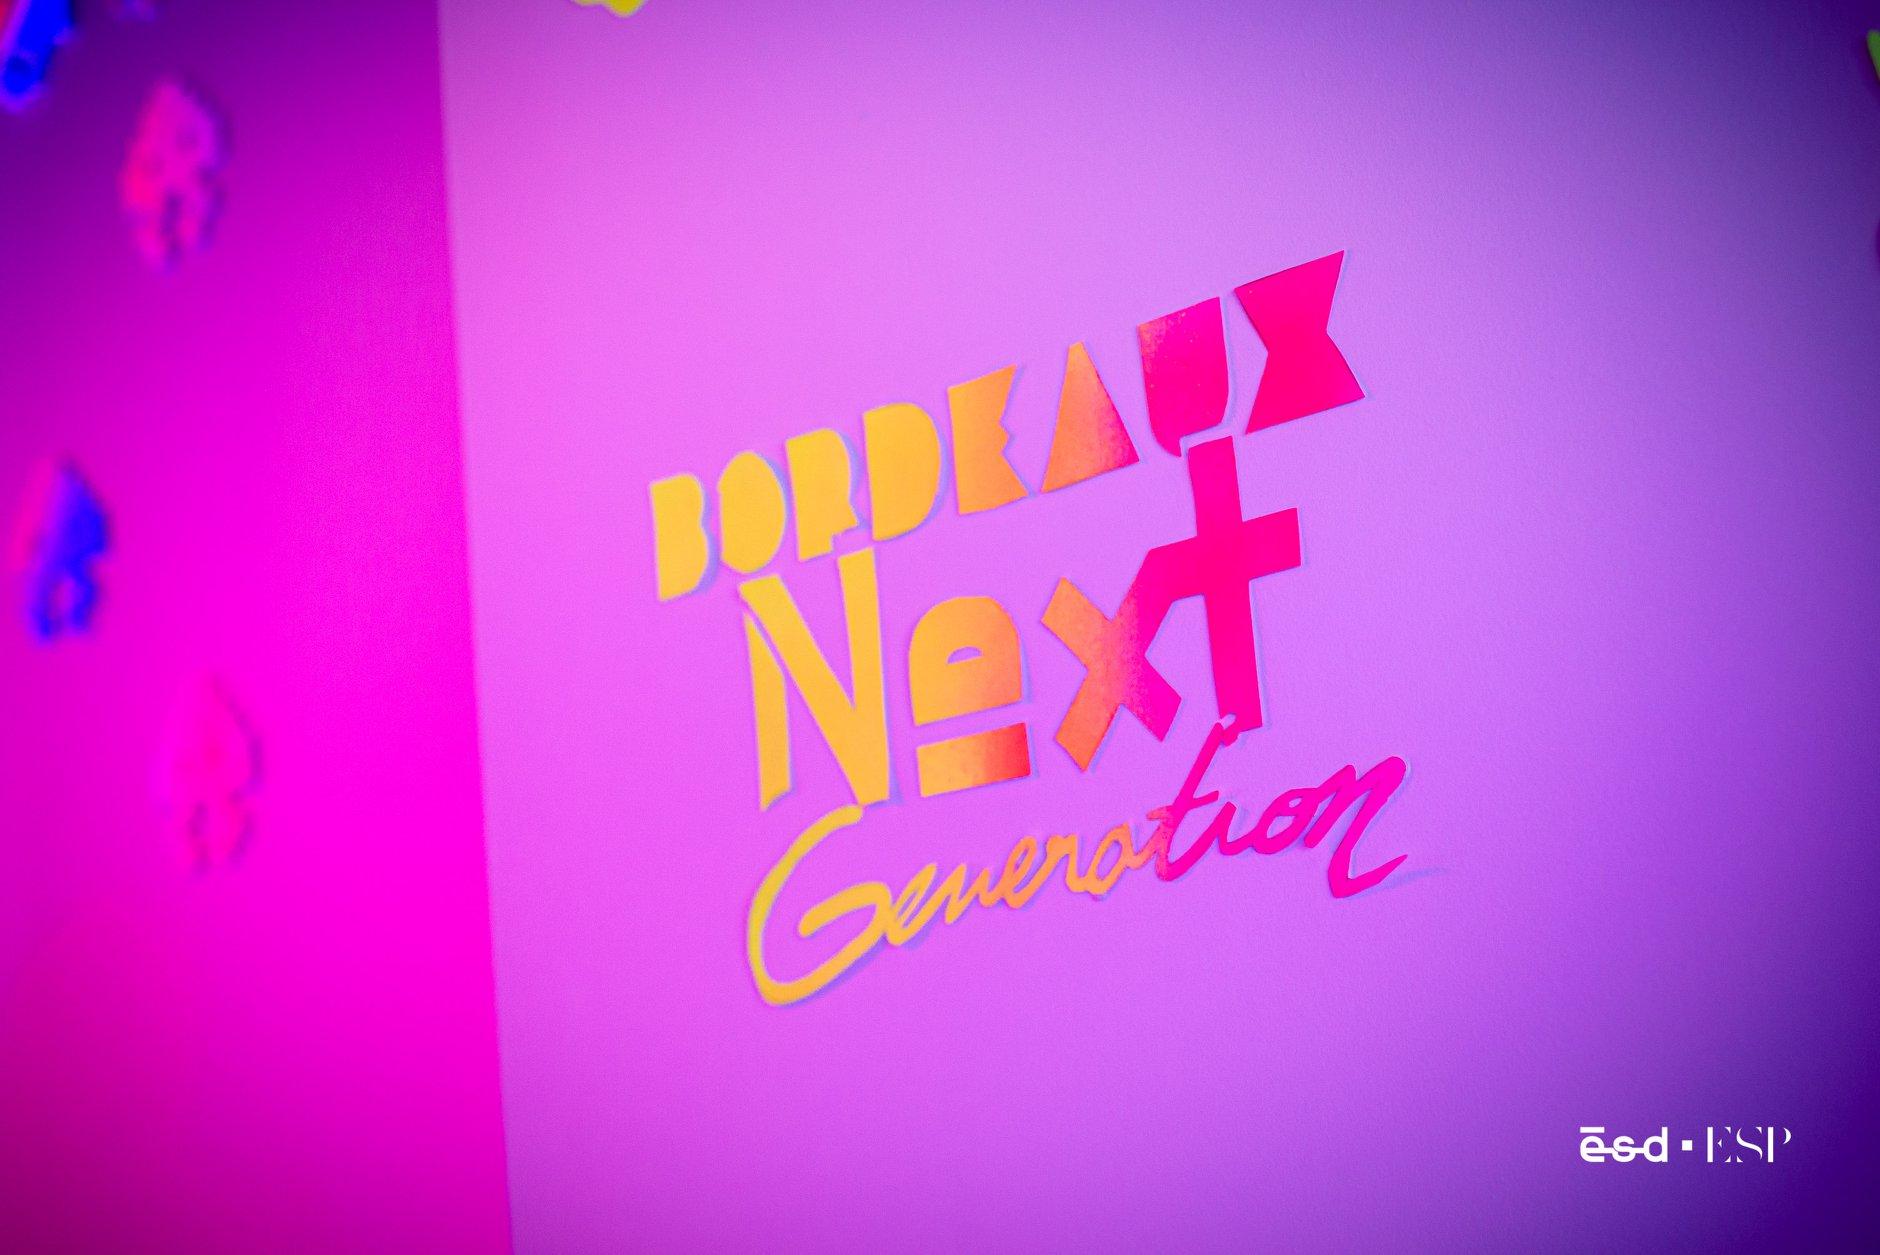 Inauguration #BordeauxNextGeneration ESP Bordeaux